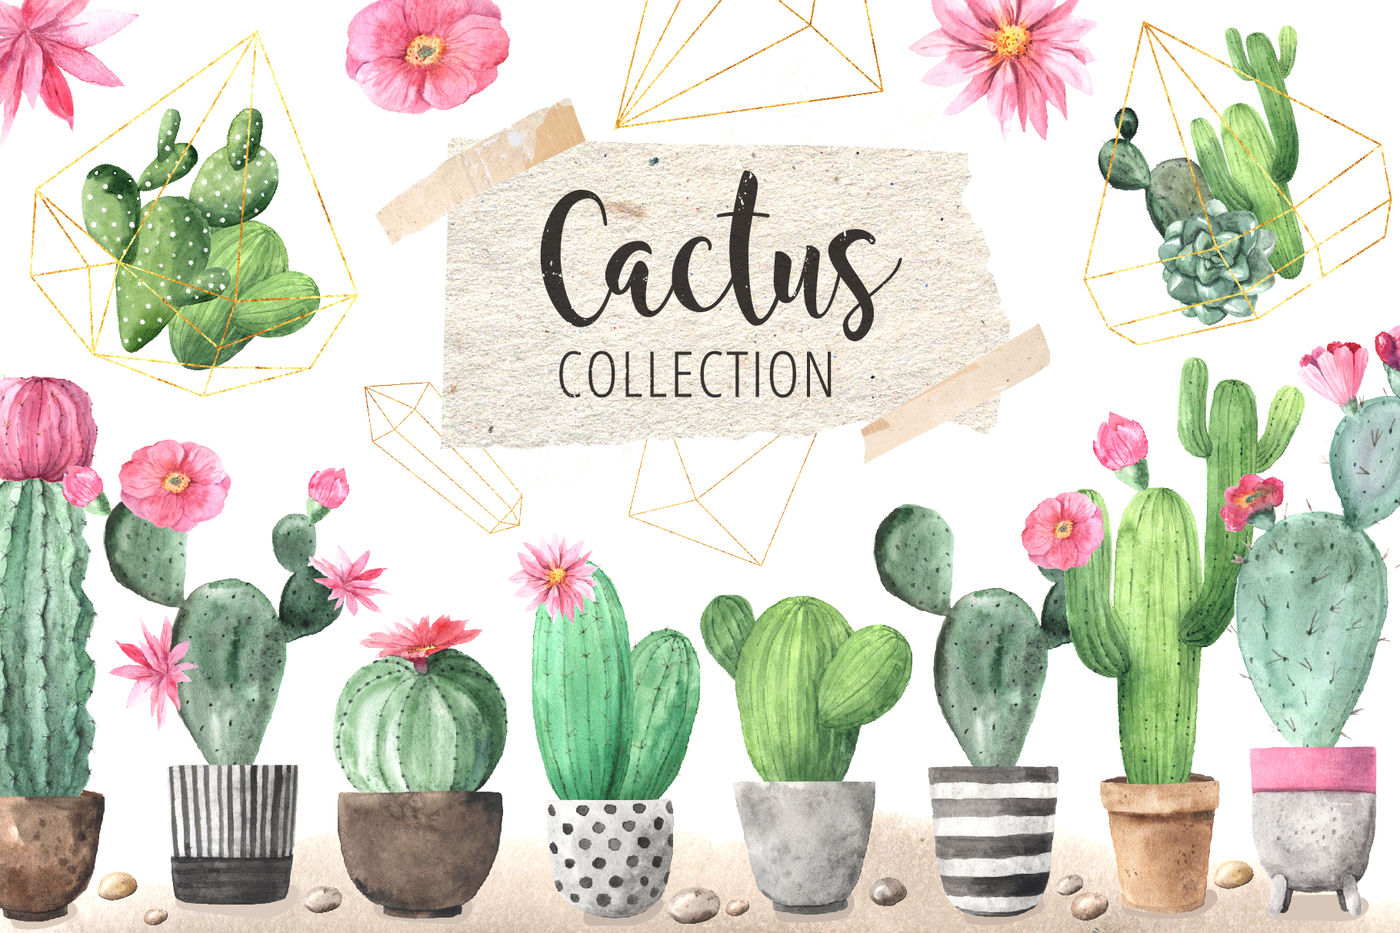 Watercolor Exotic Cactus Collection By Larysa Zabrotskaya